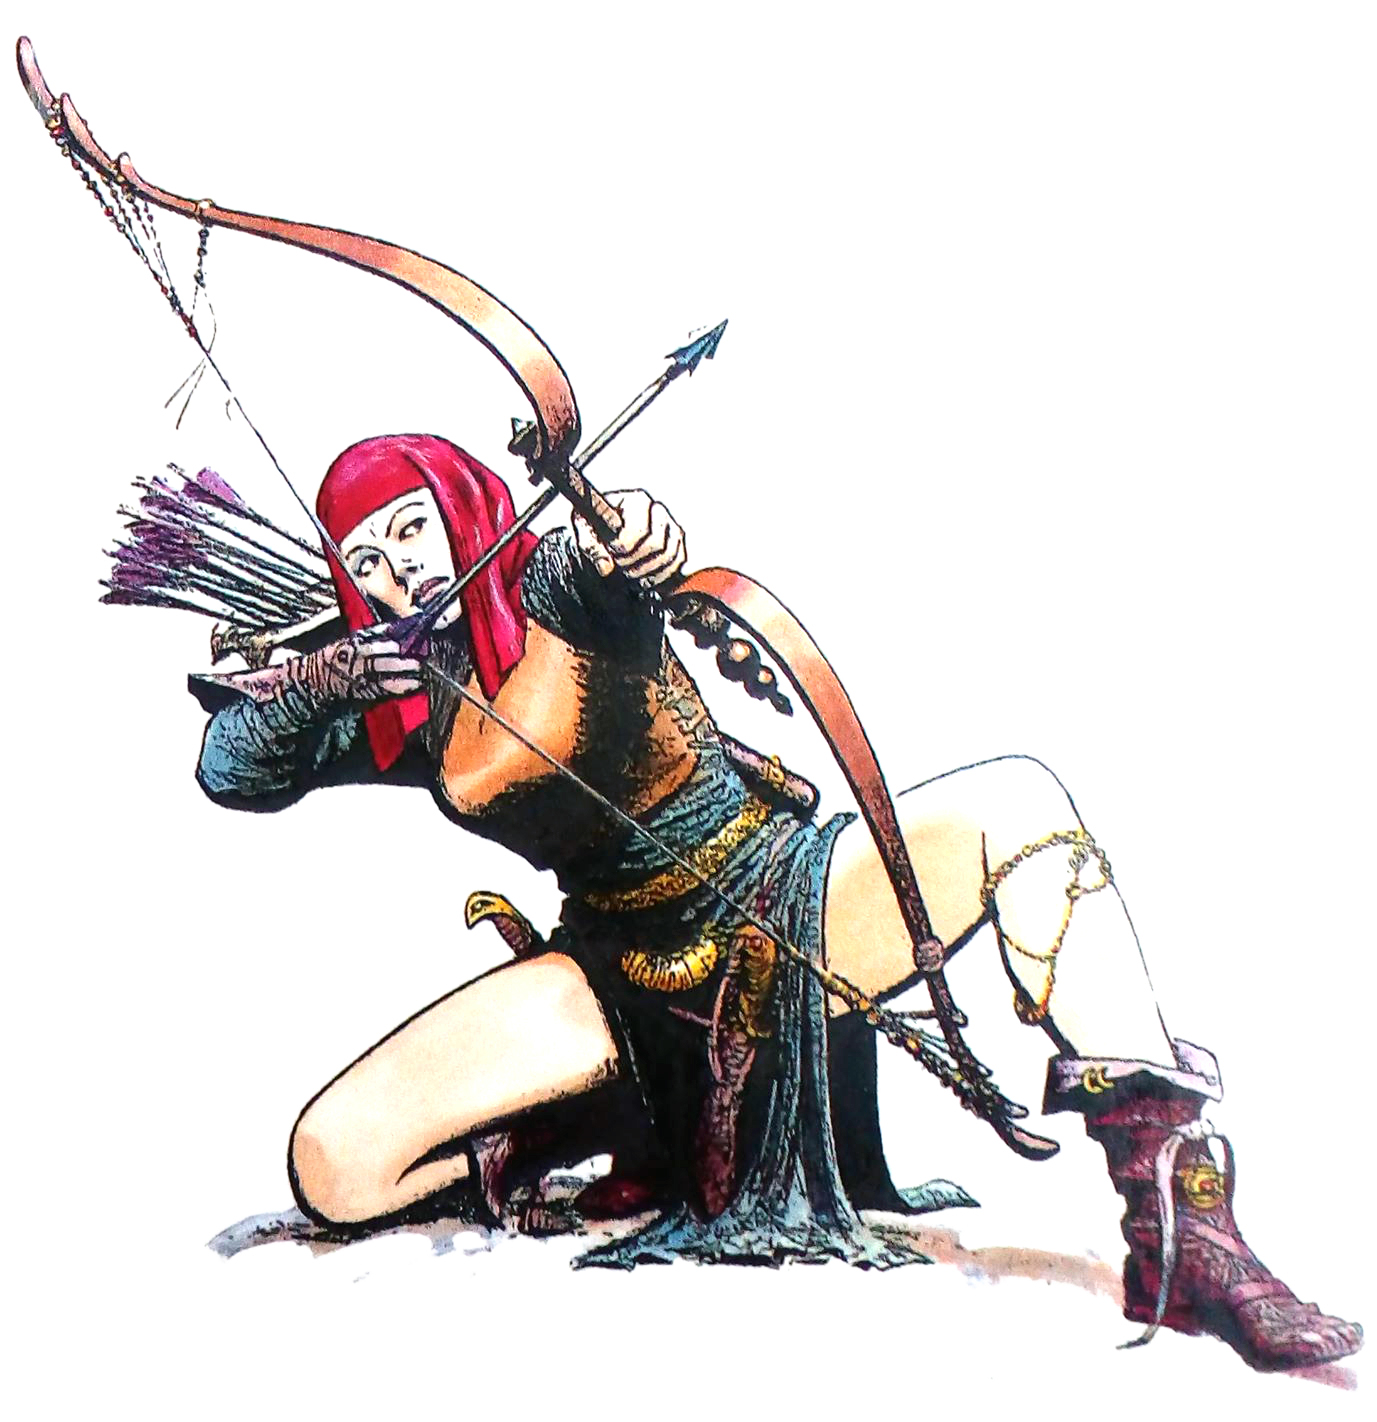 Milva's bow